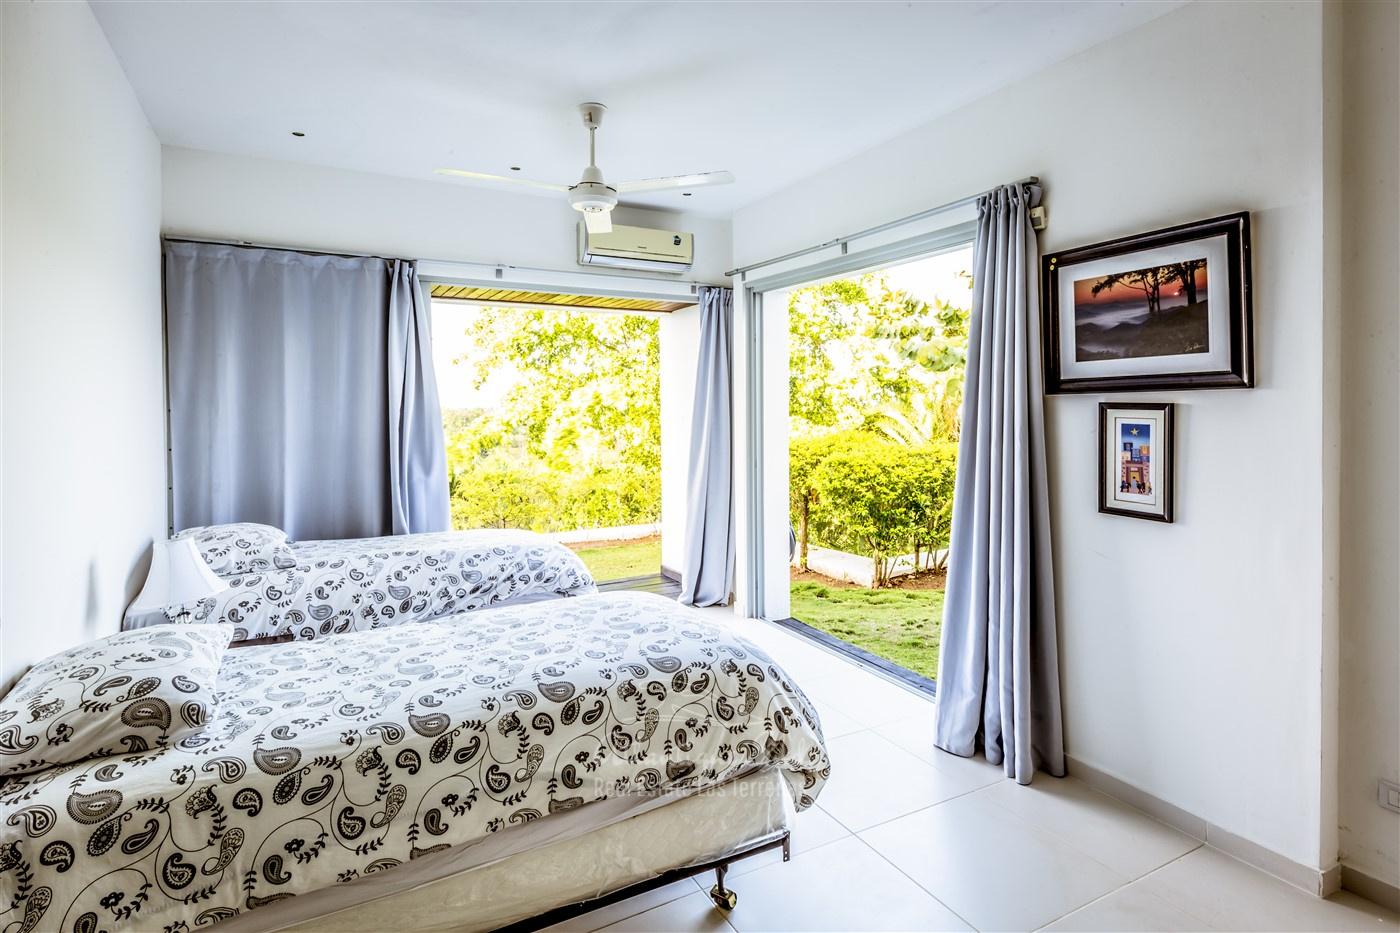 Modern Villa on a hill with ocean views Real Estate Las Terrenas Dominican Republic13.jpg